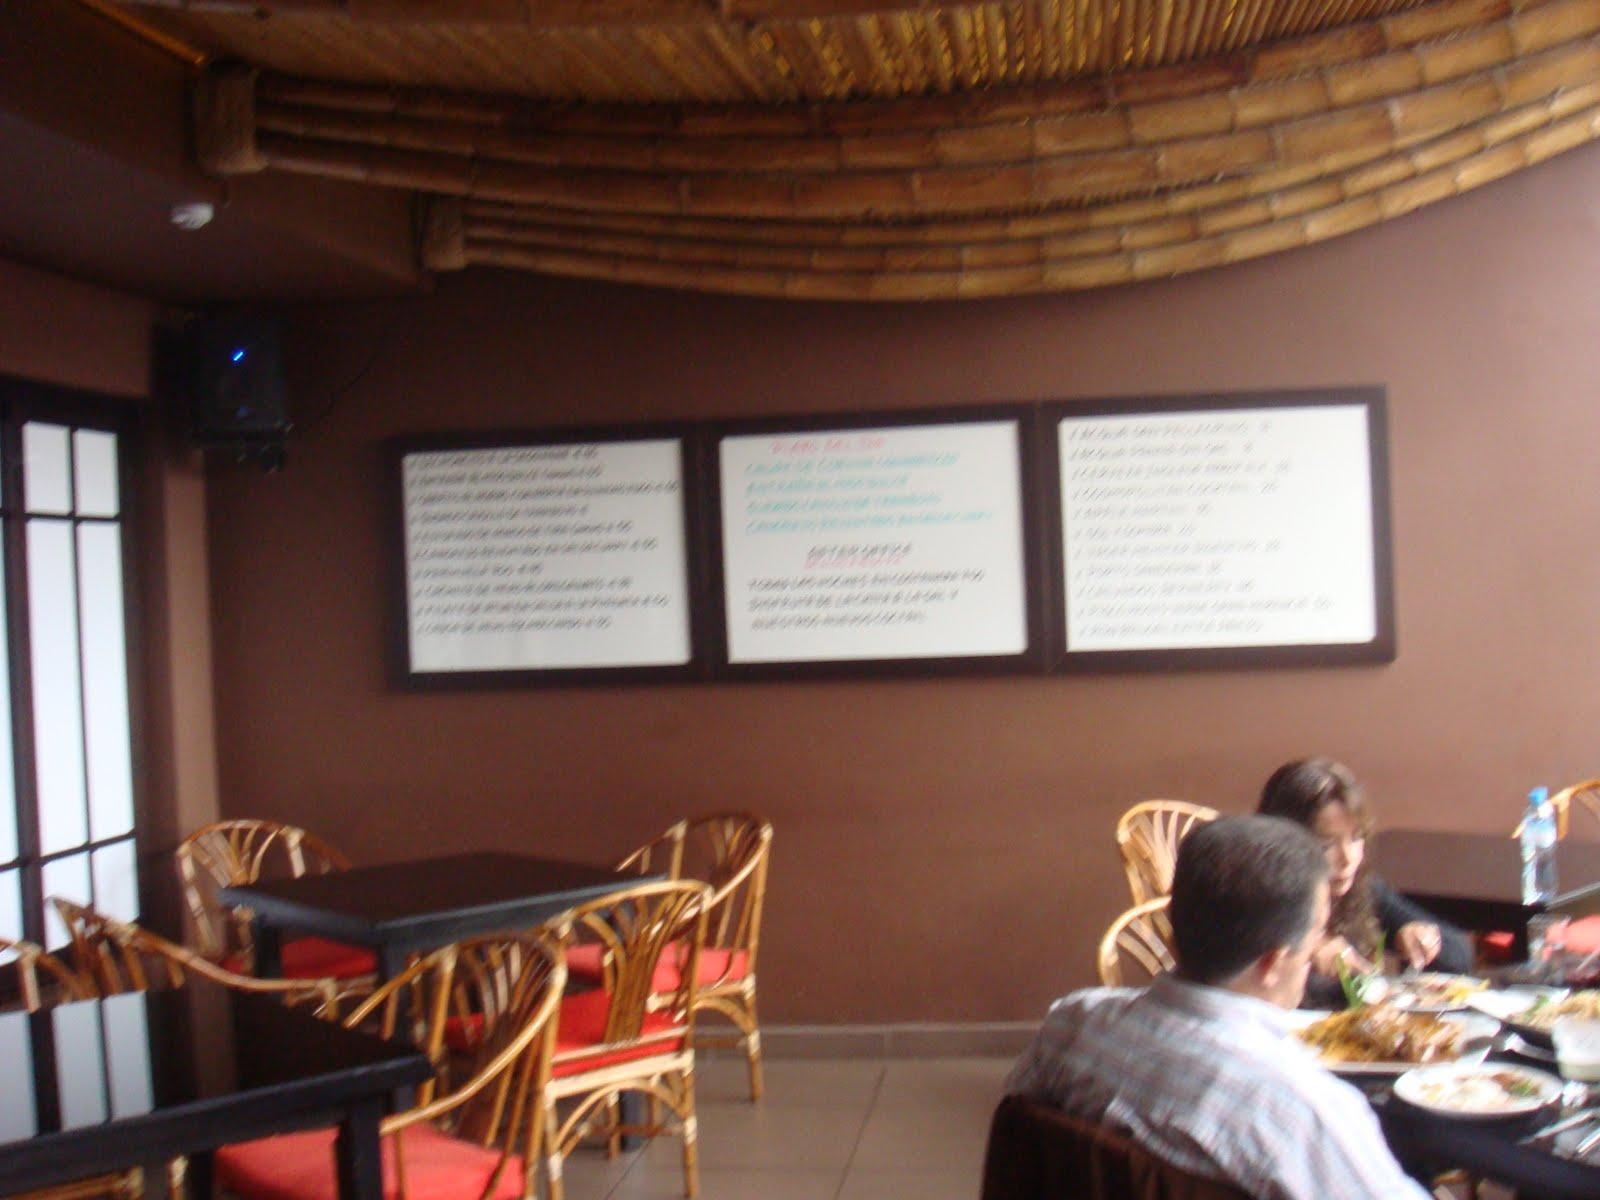 Dayana Leandro Costanera 700 un must en cocina Nikkei en Lima